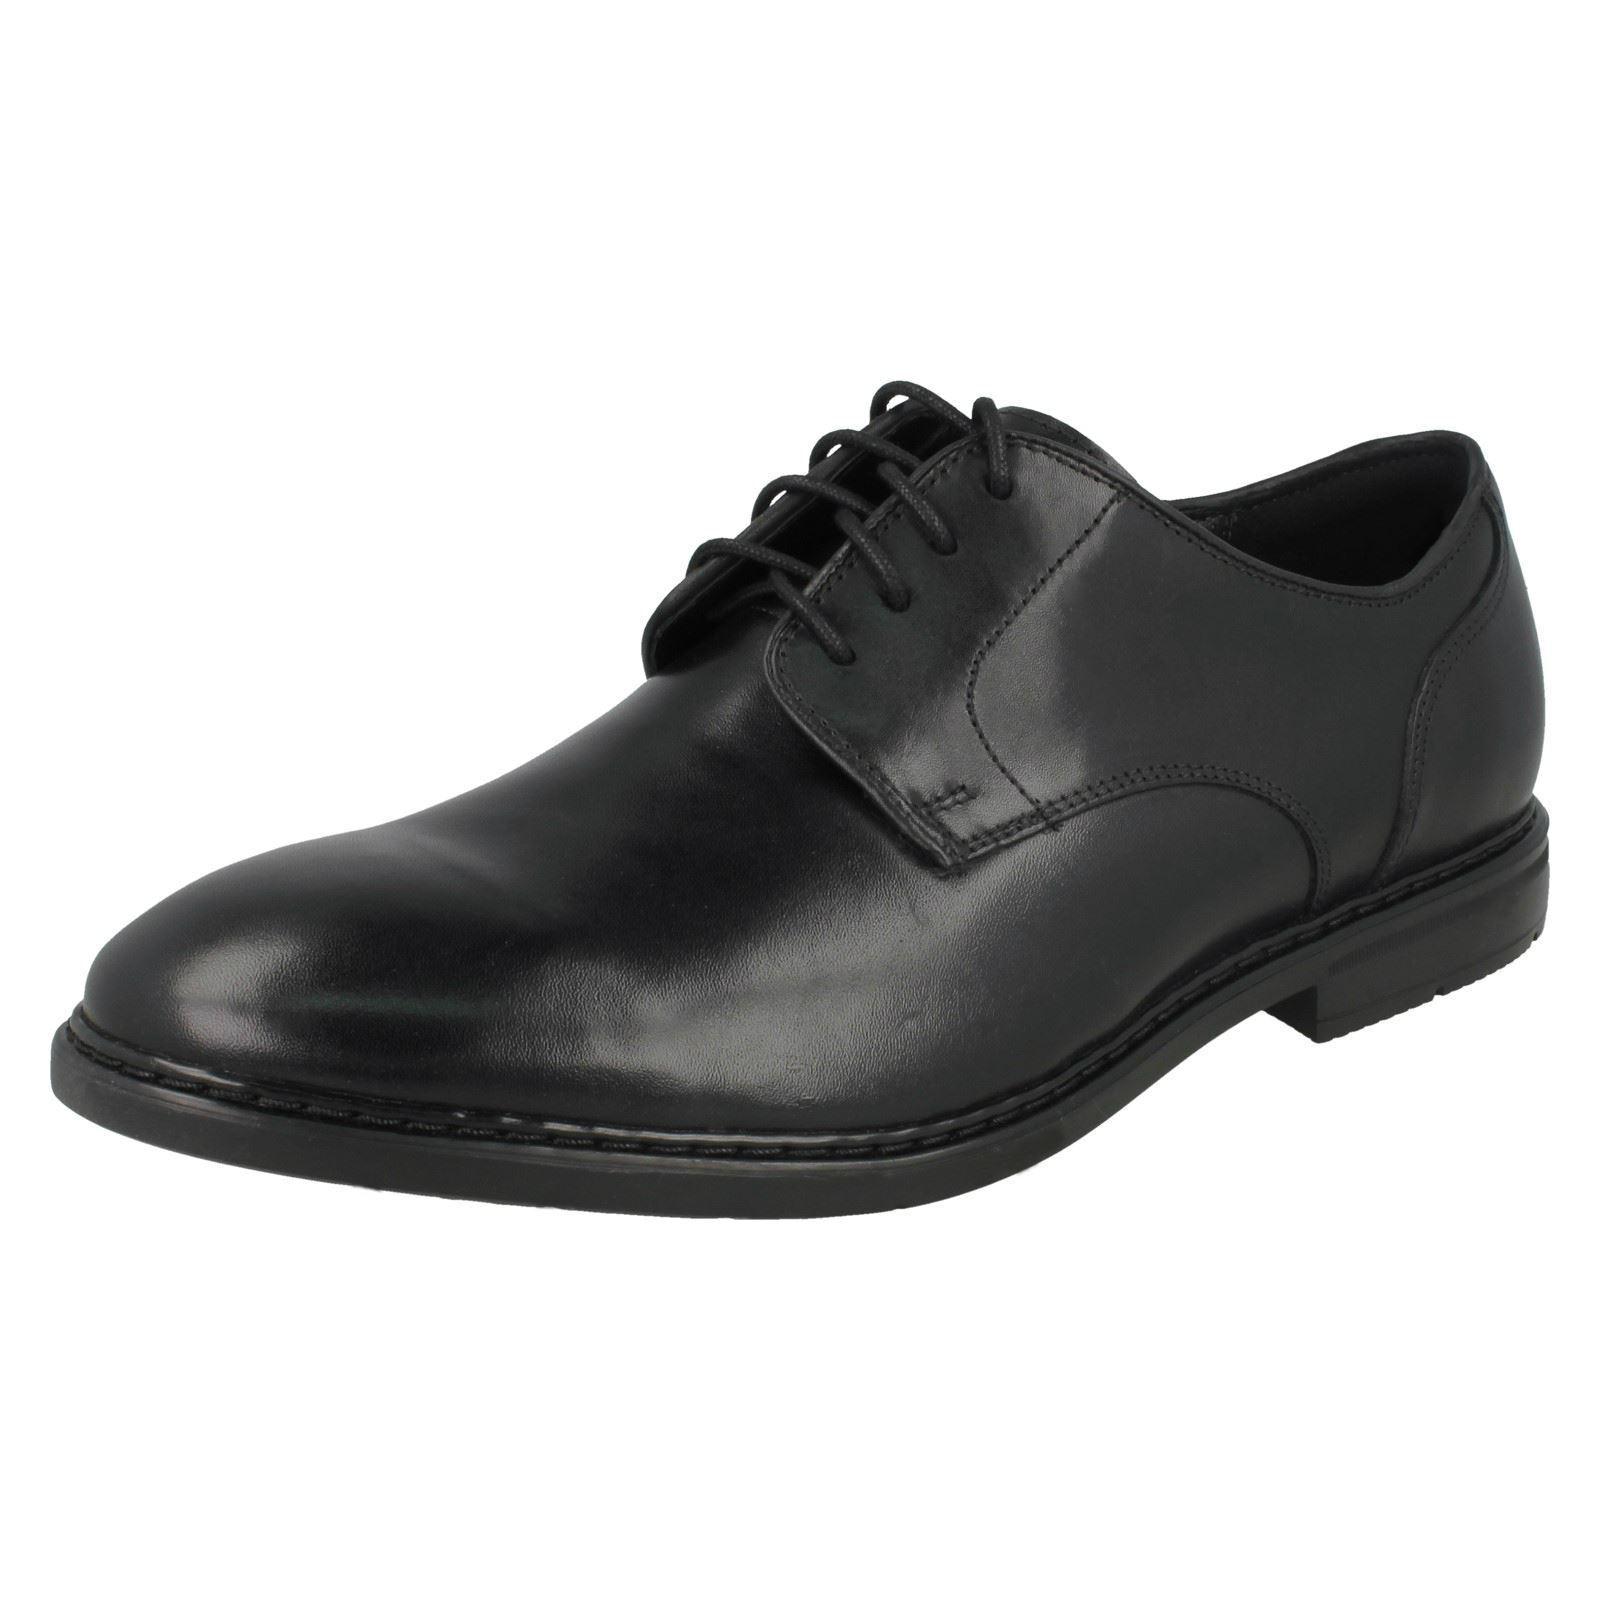 Clarks Herren Leder Schnürschuhe 'Banbury Spitze'